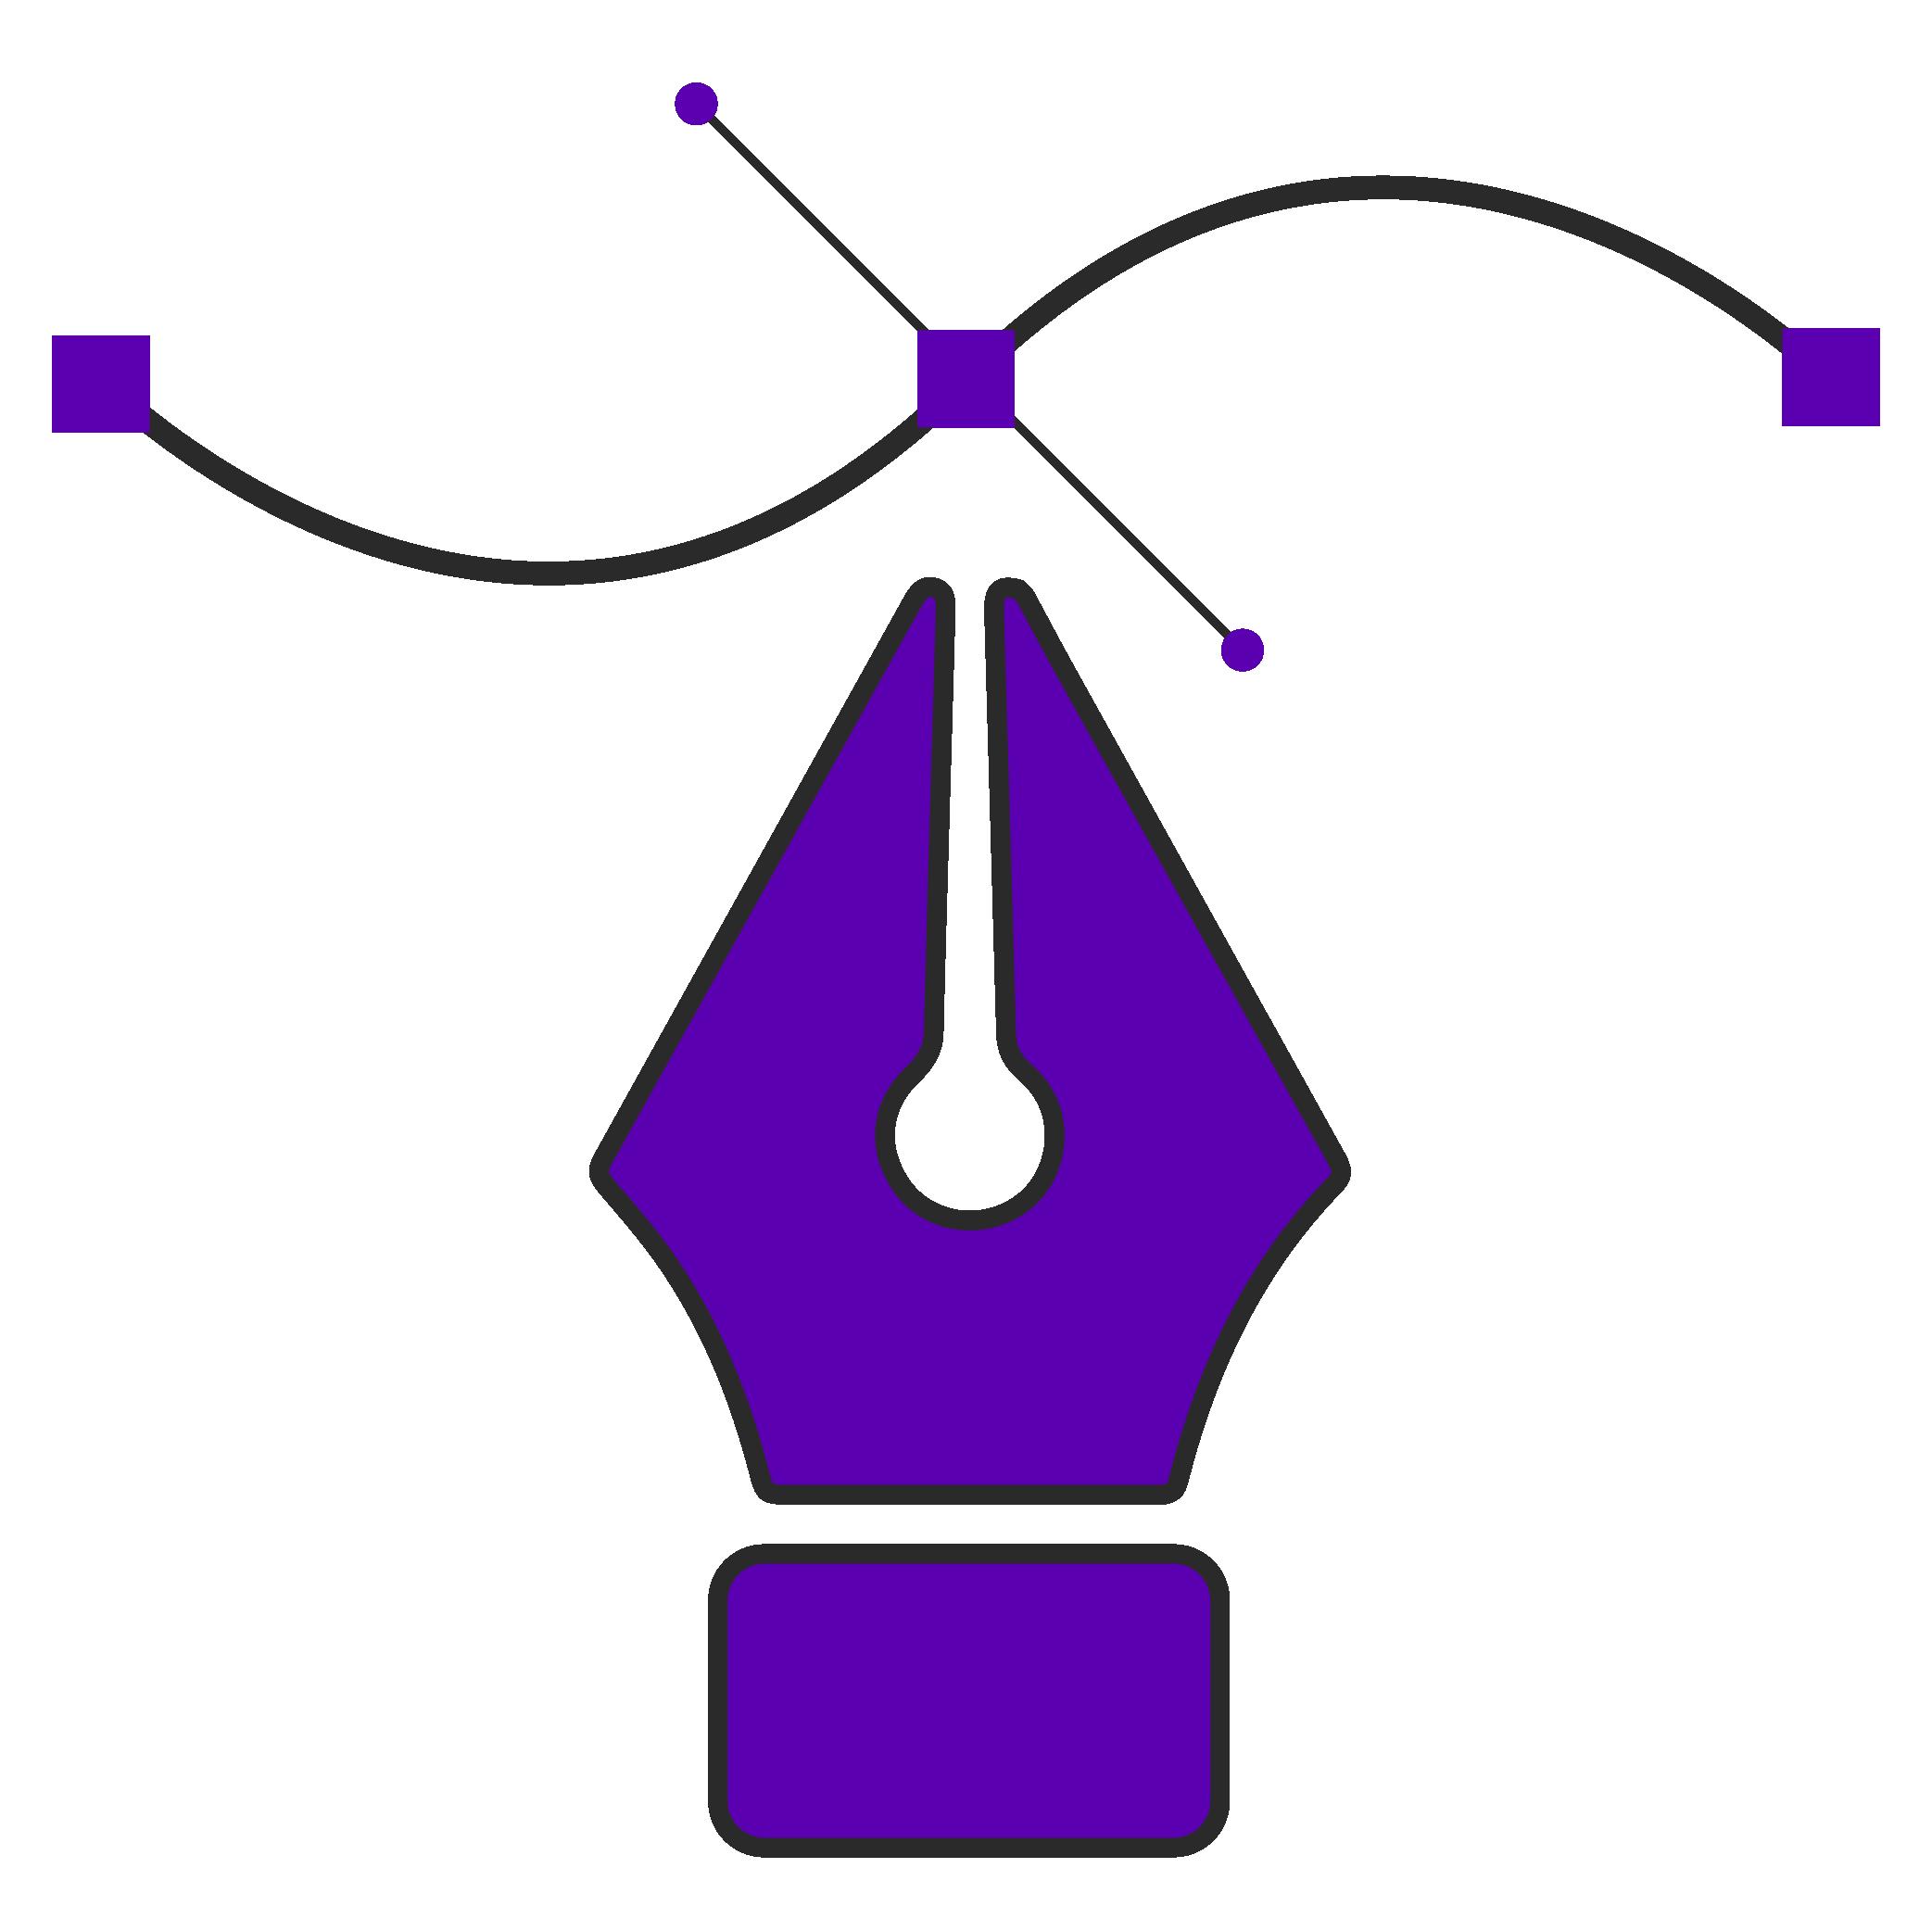 vectorisation